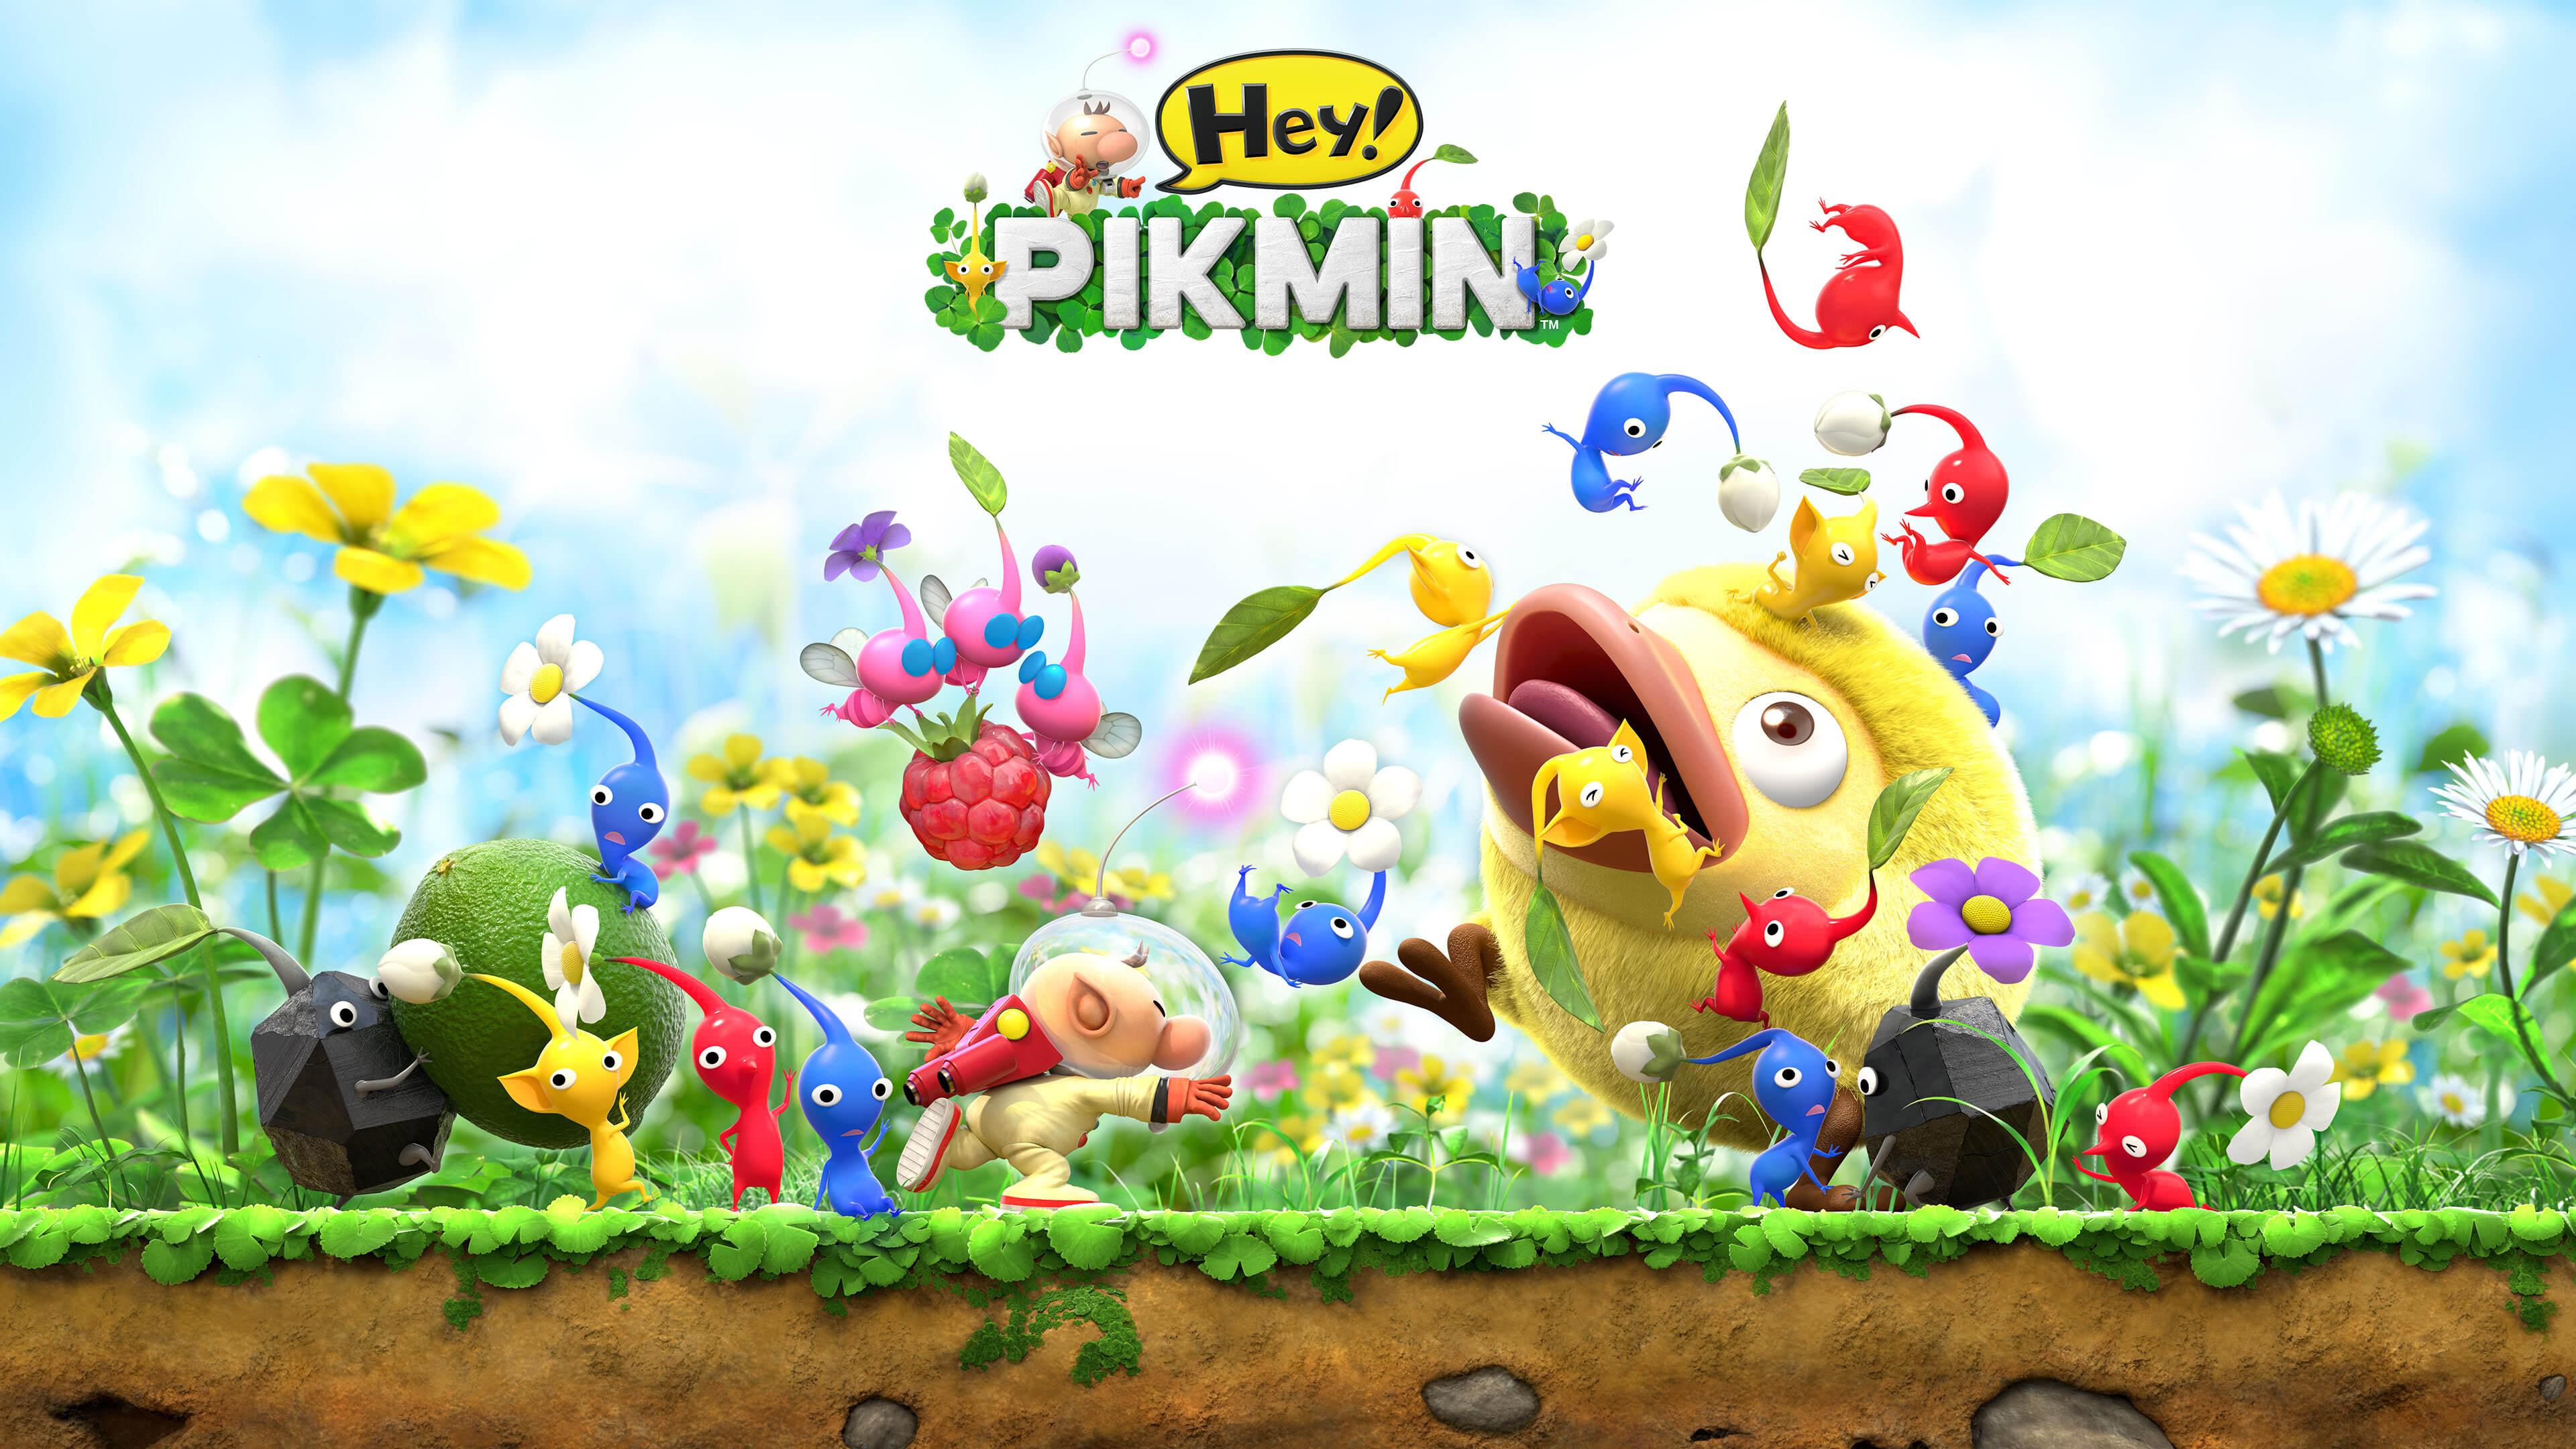 Hey Pikmin Characters UHD 4K Wallpaper Pixelz 3840x2160